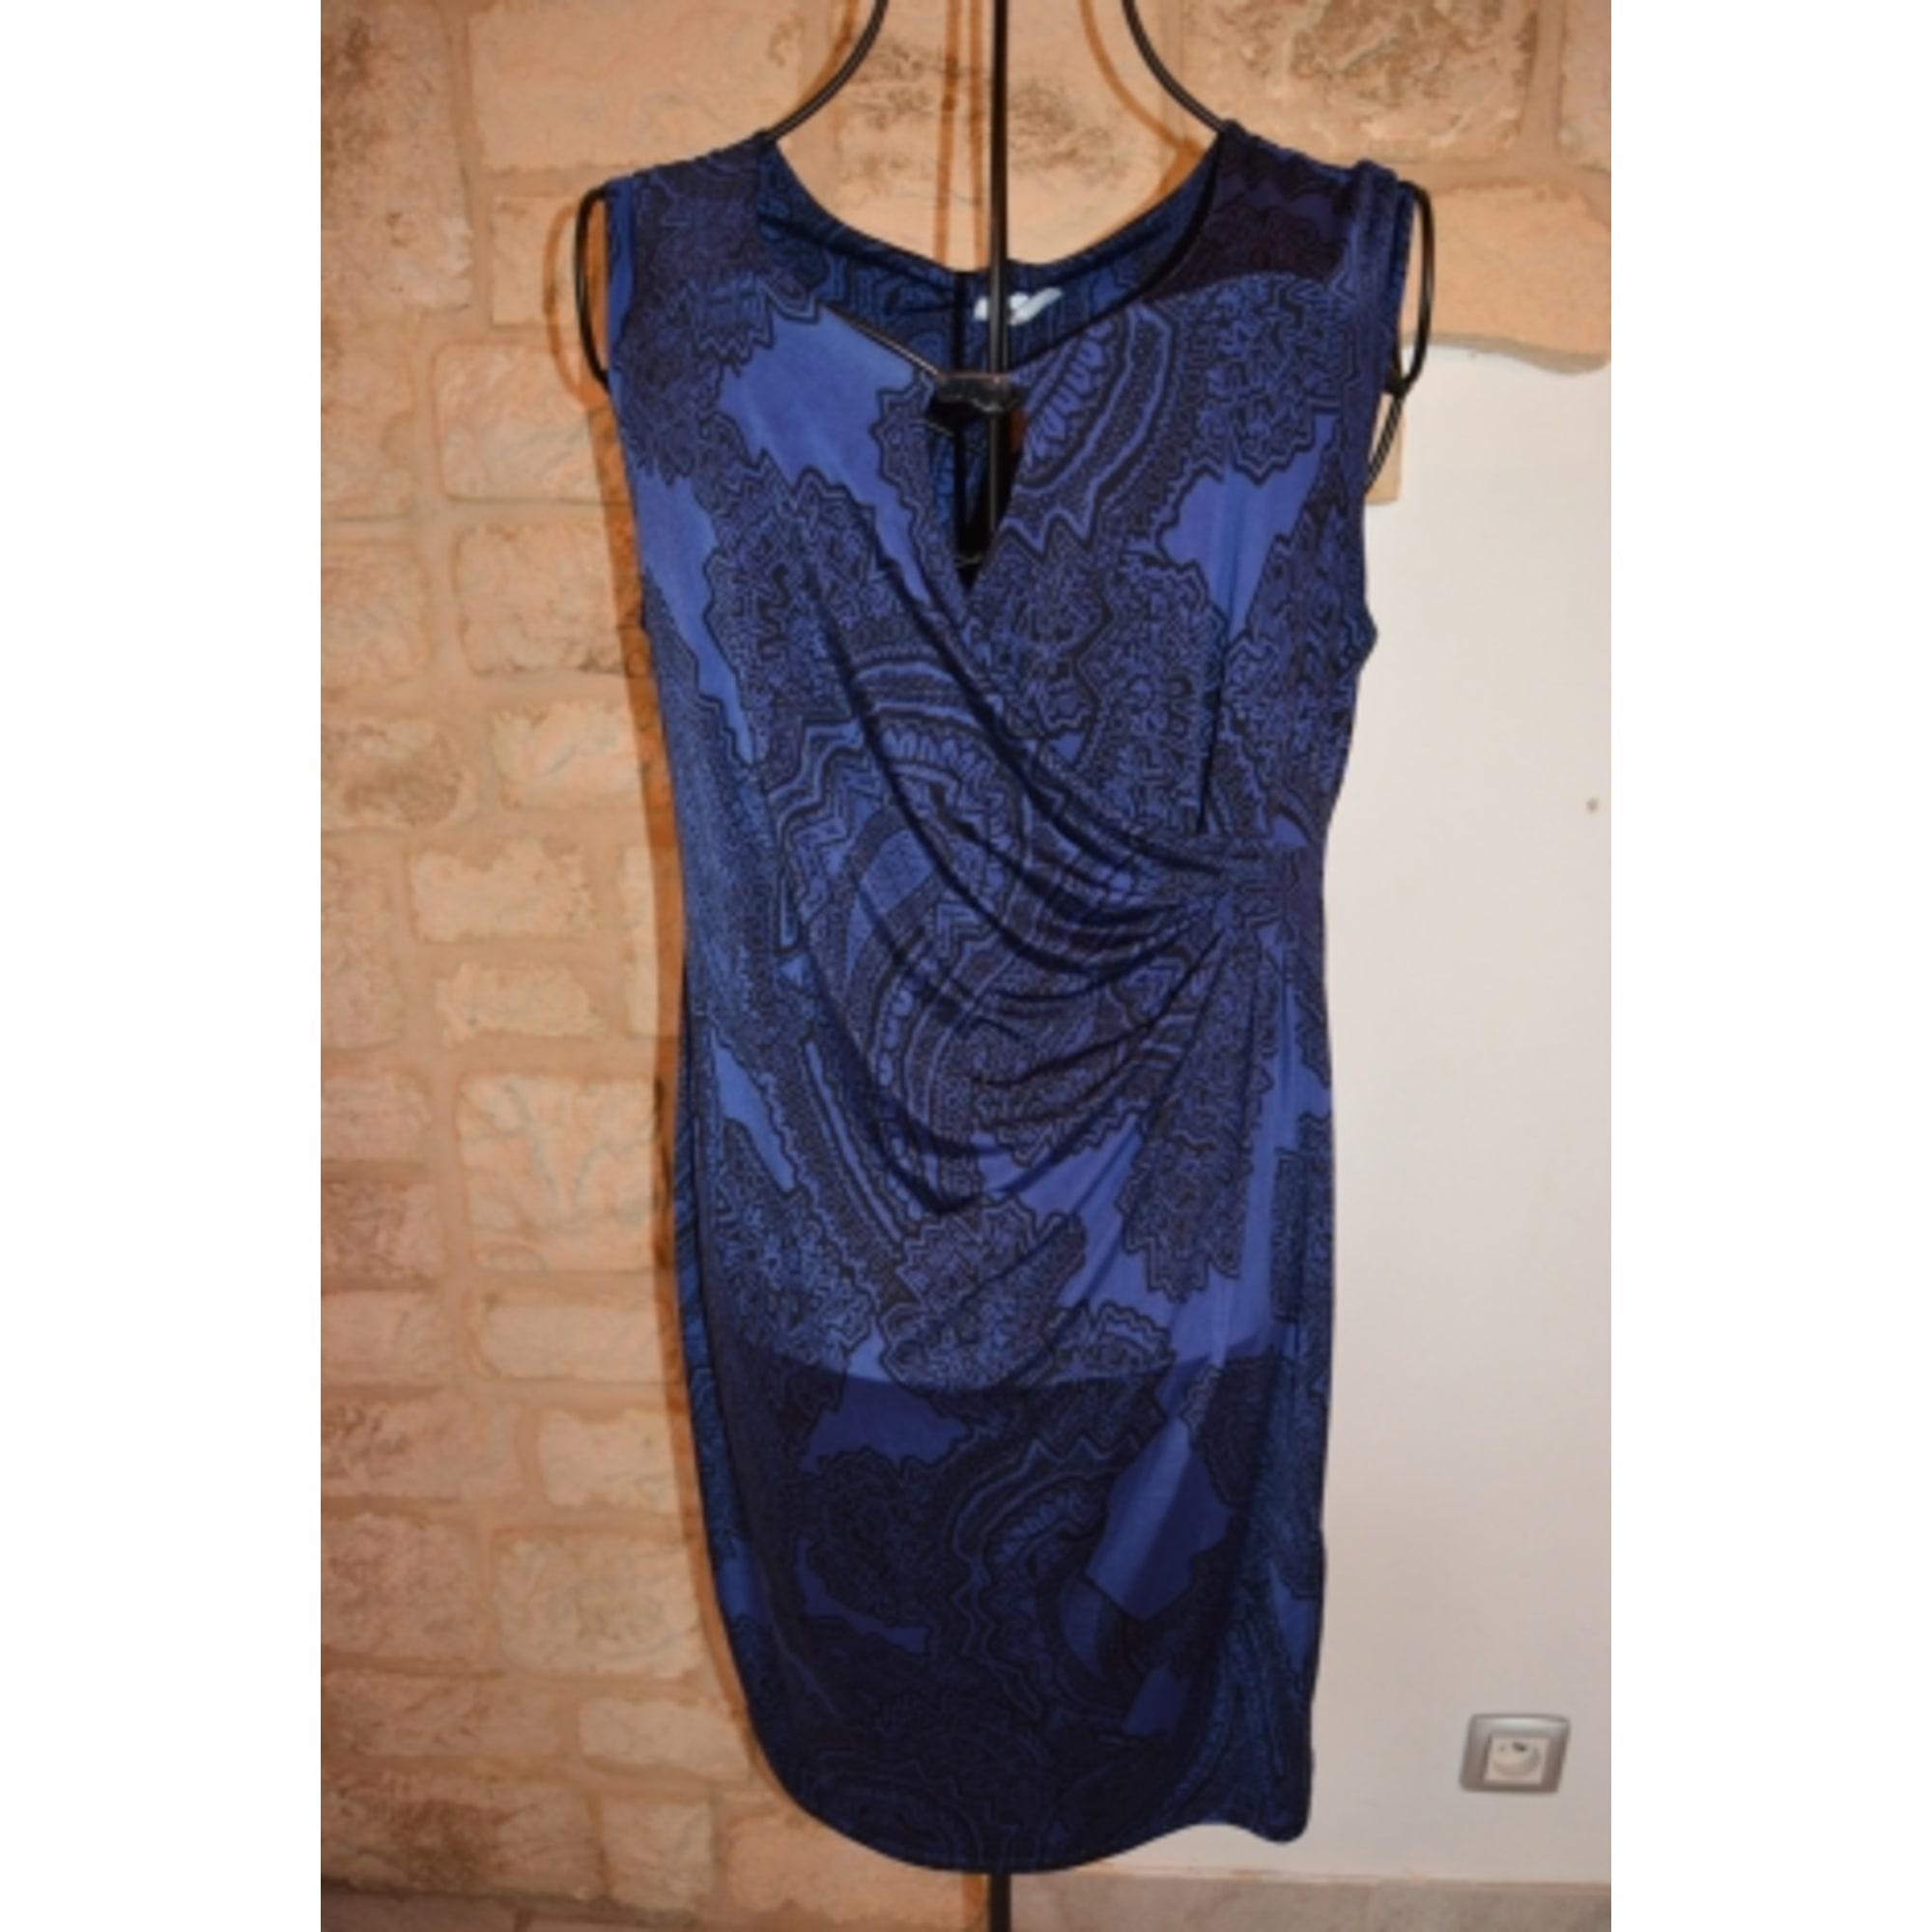 Robe Courte Jacqueline Riu 42 L Xl T4 Bleu Vendu Par Light Peony 5039132